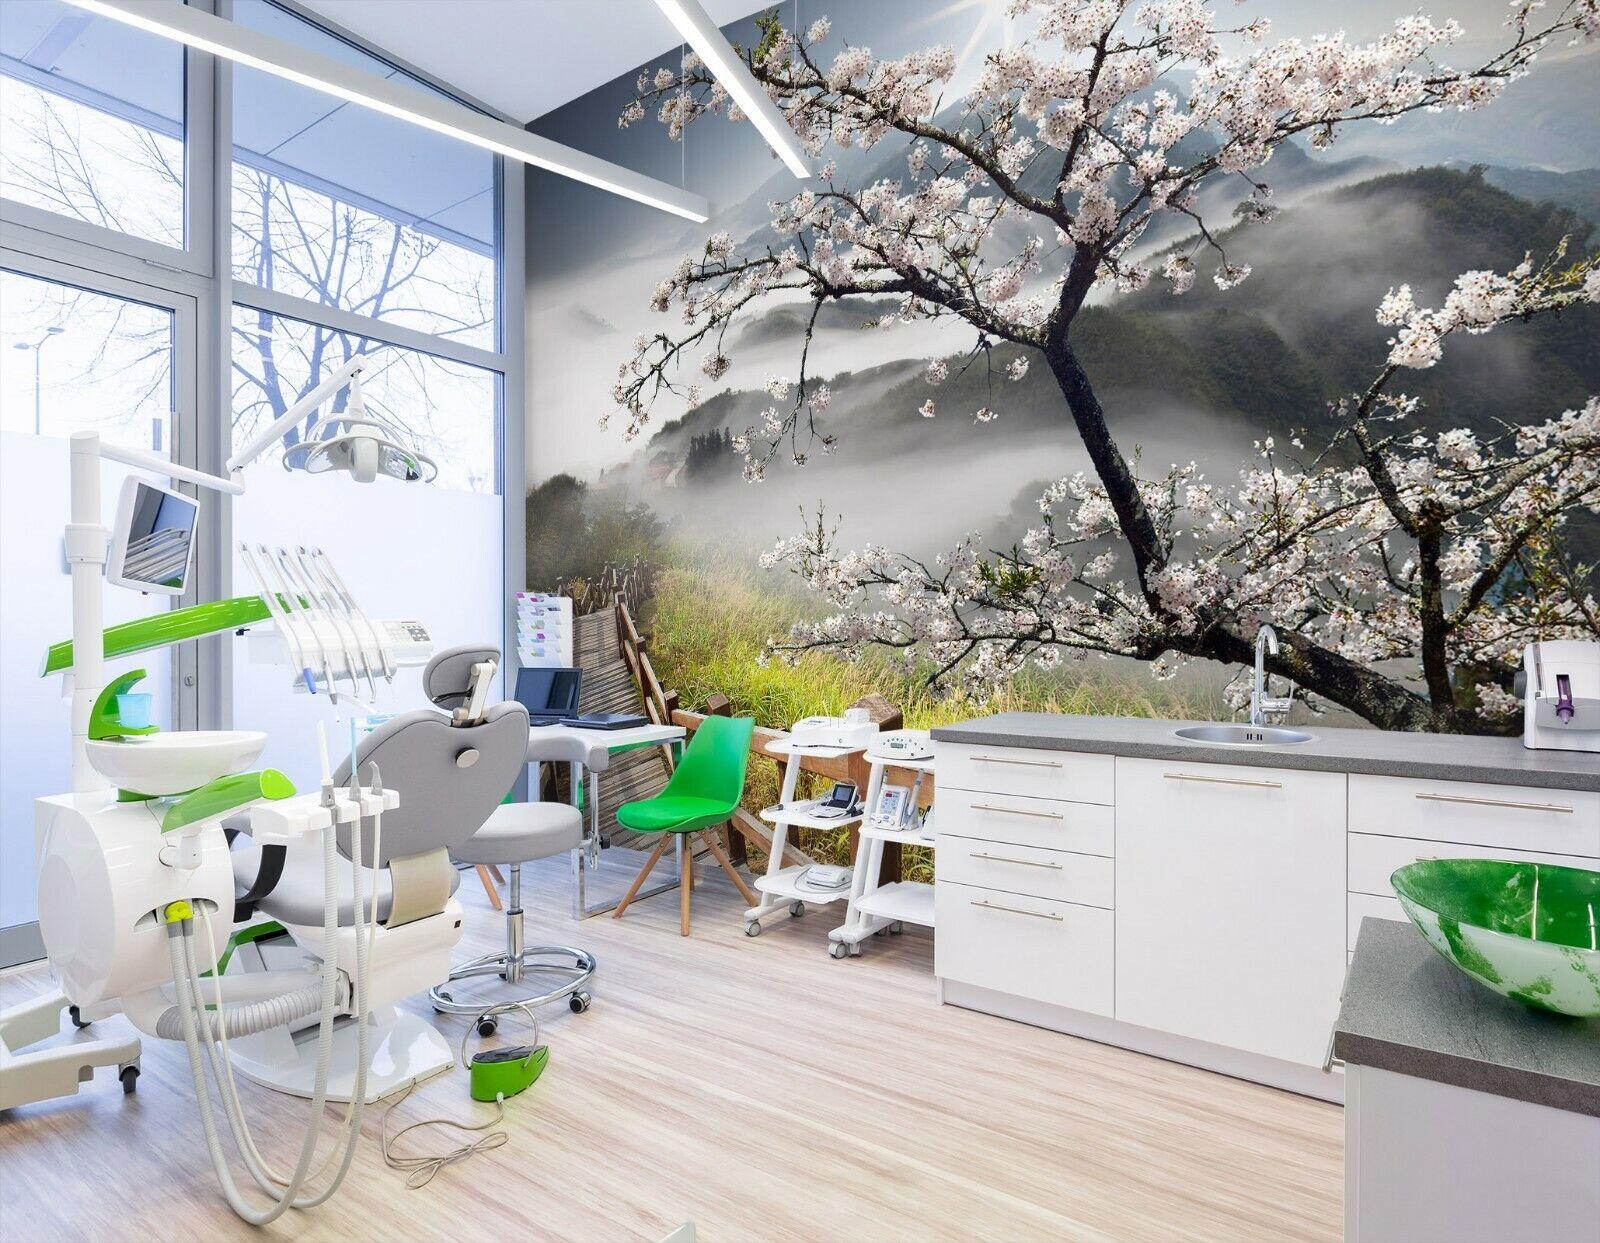 3D Pflaumenblüte Berg M64 Geschäft Tapete Wandgemälde Selbstklebend Handel An